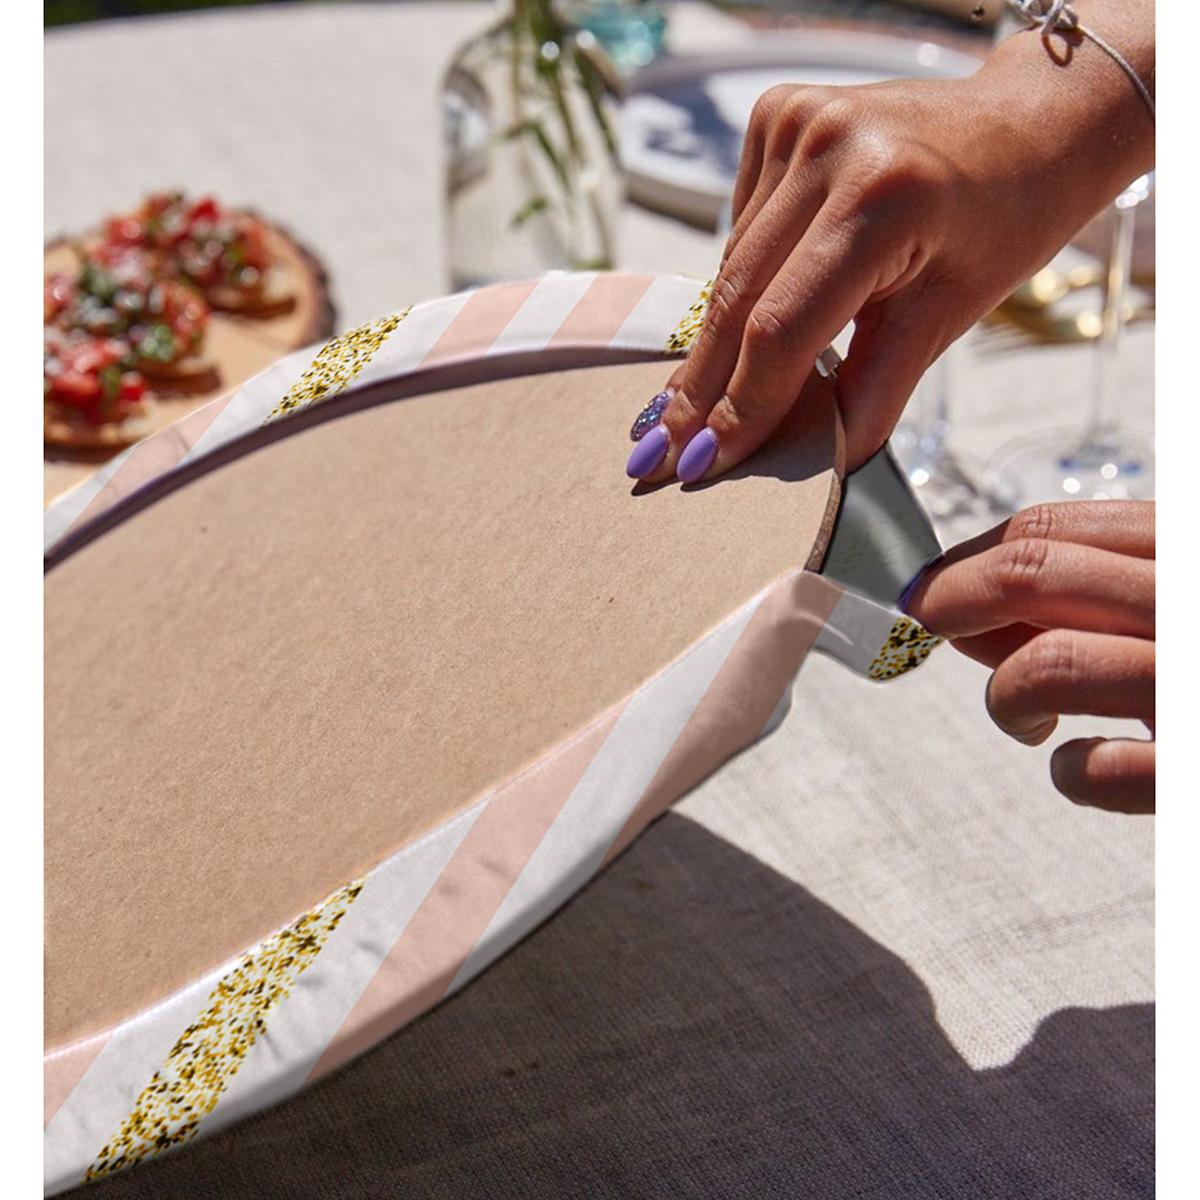 Realhomes Beyaz Zeminli Pembe Yatay Çizgili Dijital Baskılı Modern 2'li Yuvarlak Servis Altlığı - Supla Realhomes